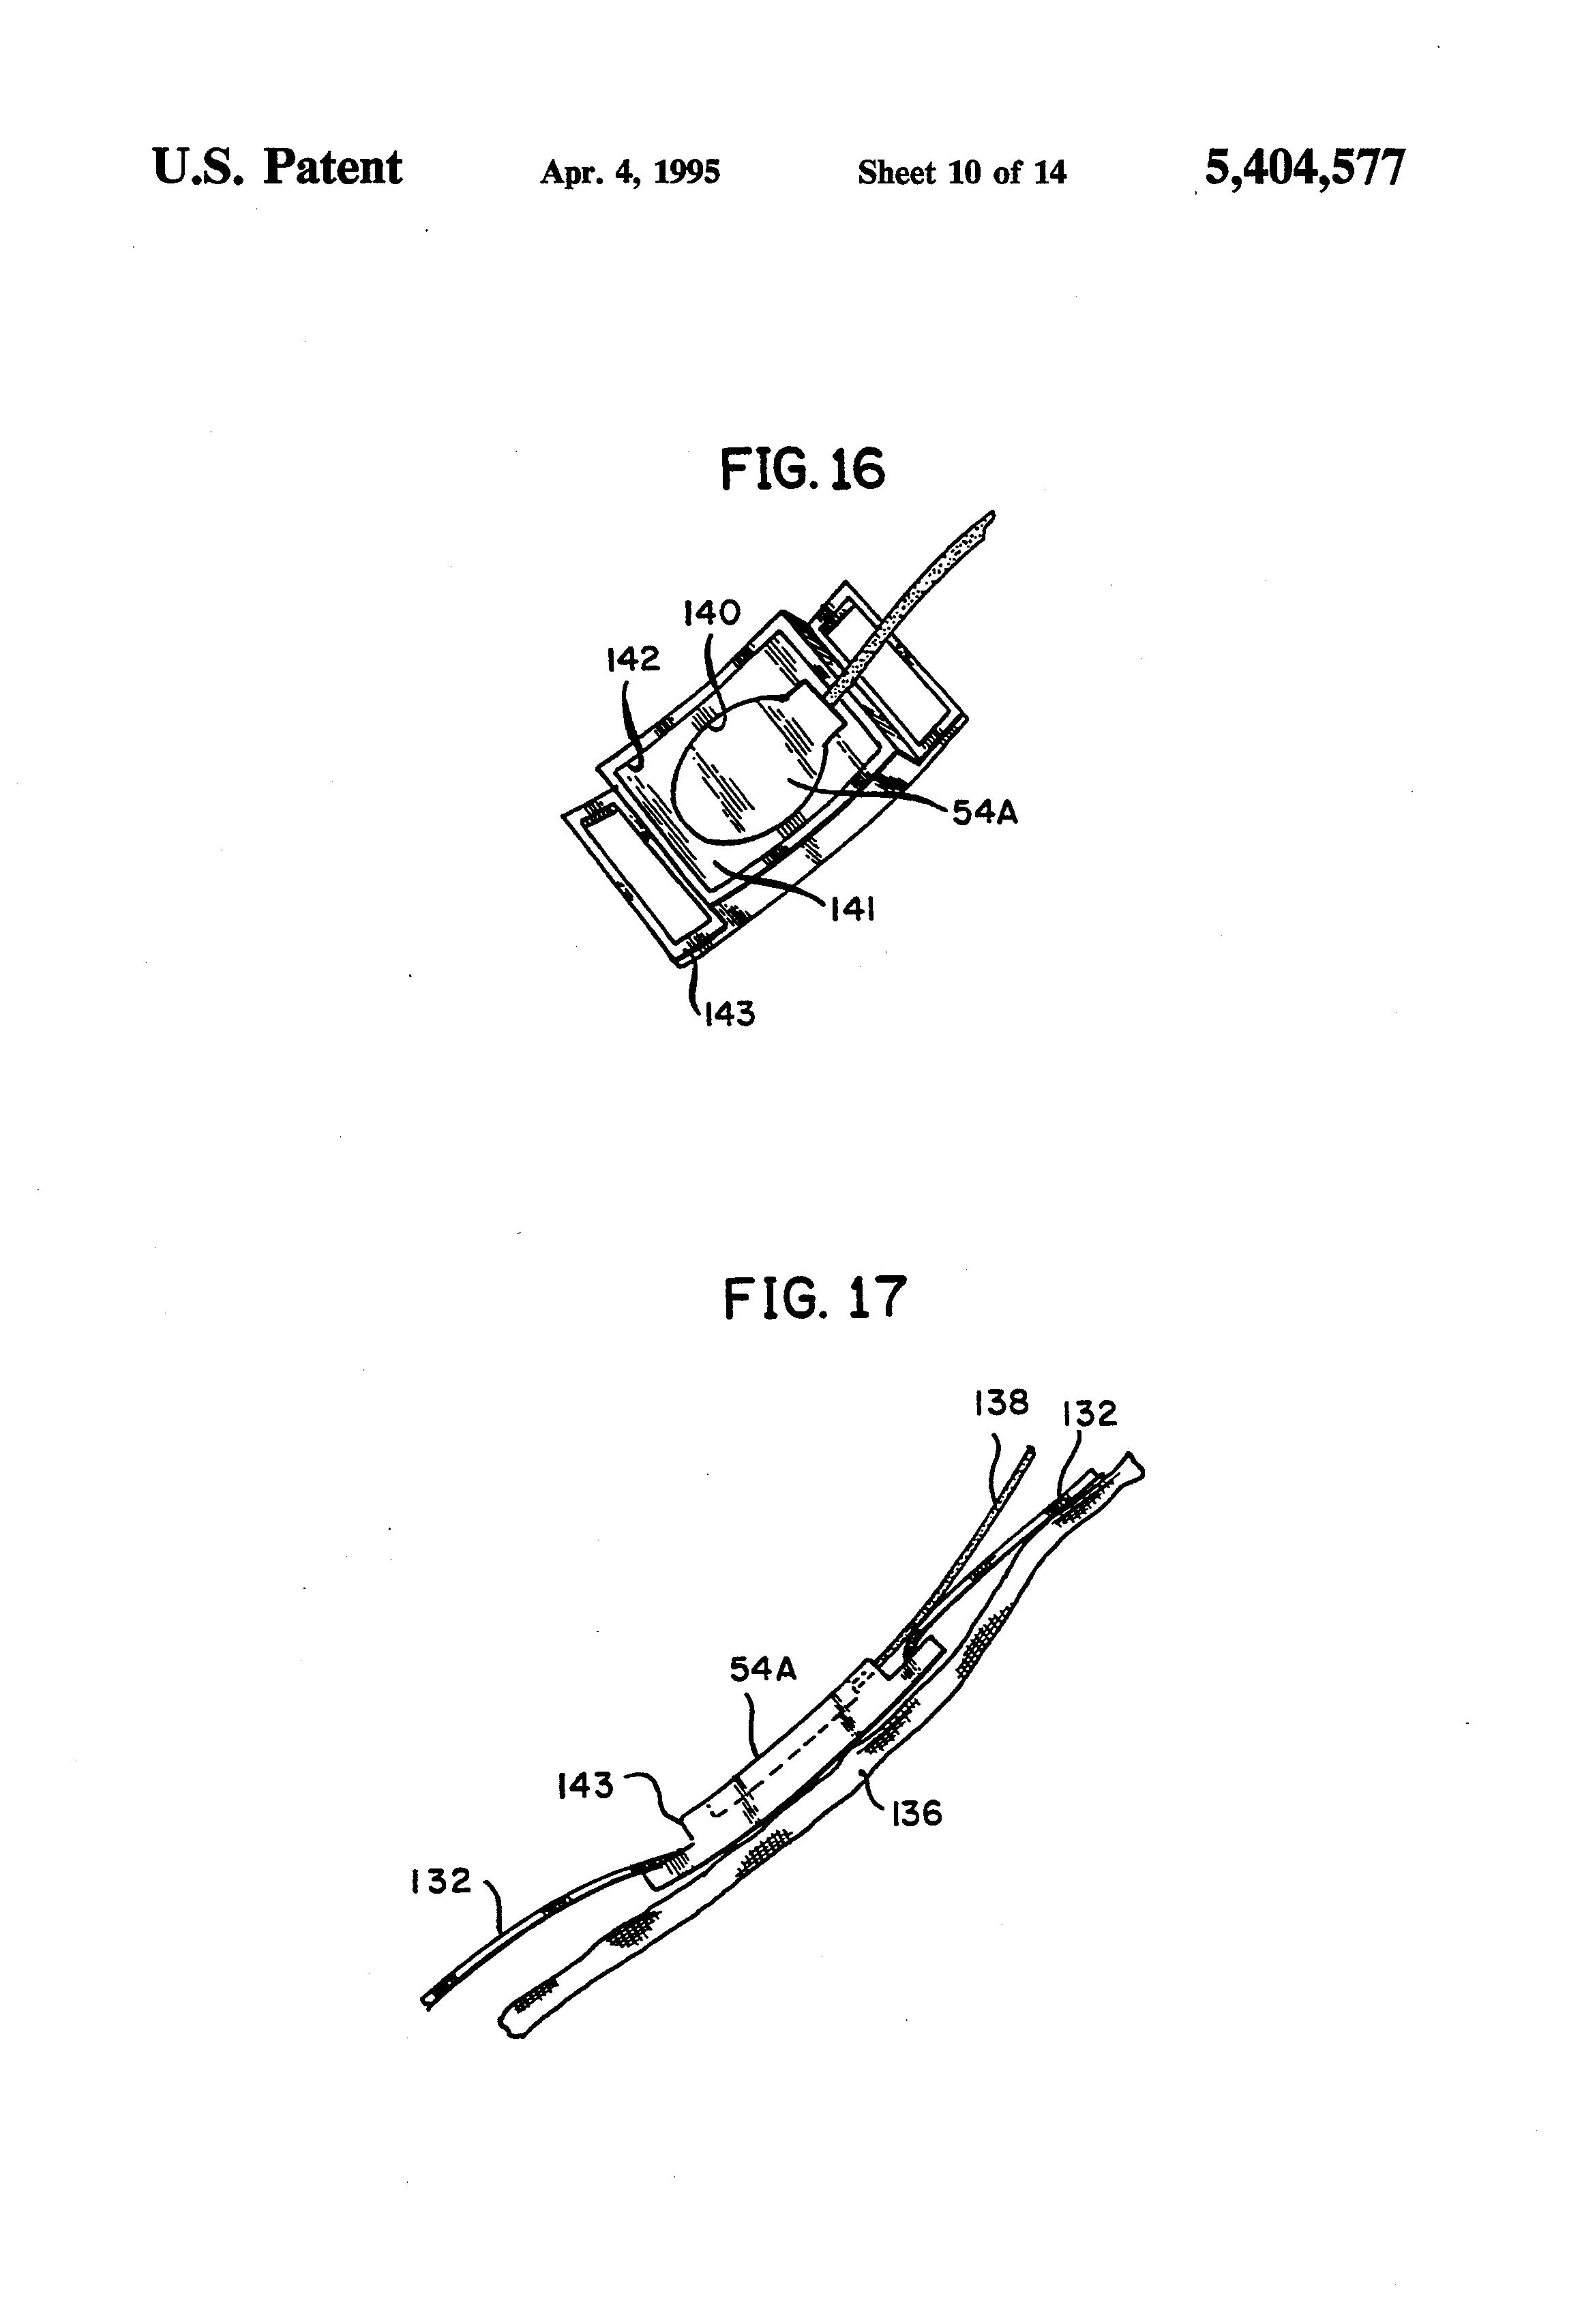 4 Pair Microphone Wiring Diagram 3 Pin Xlr Wiring Diagram ... Aircraft Microphone Jack Wiring Diagram on